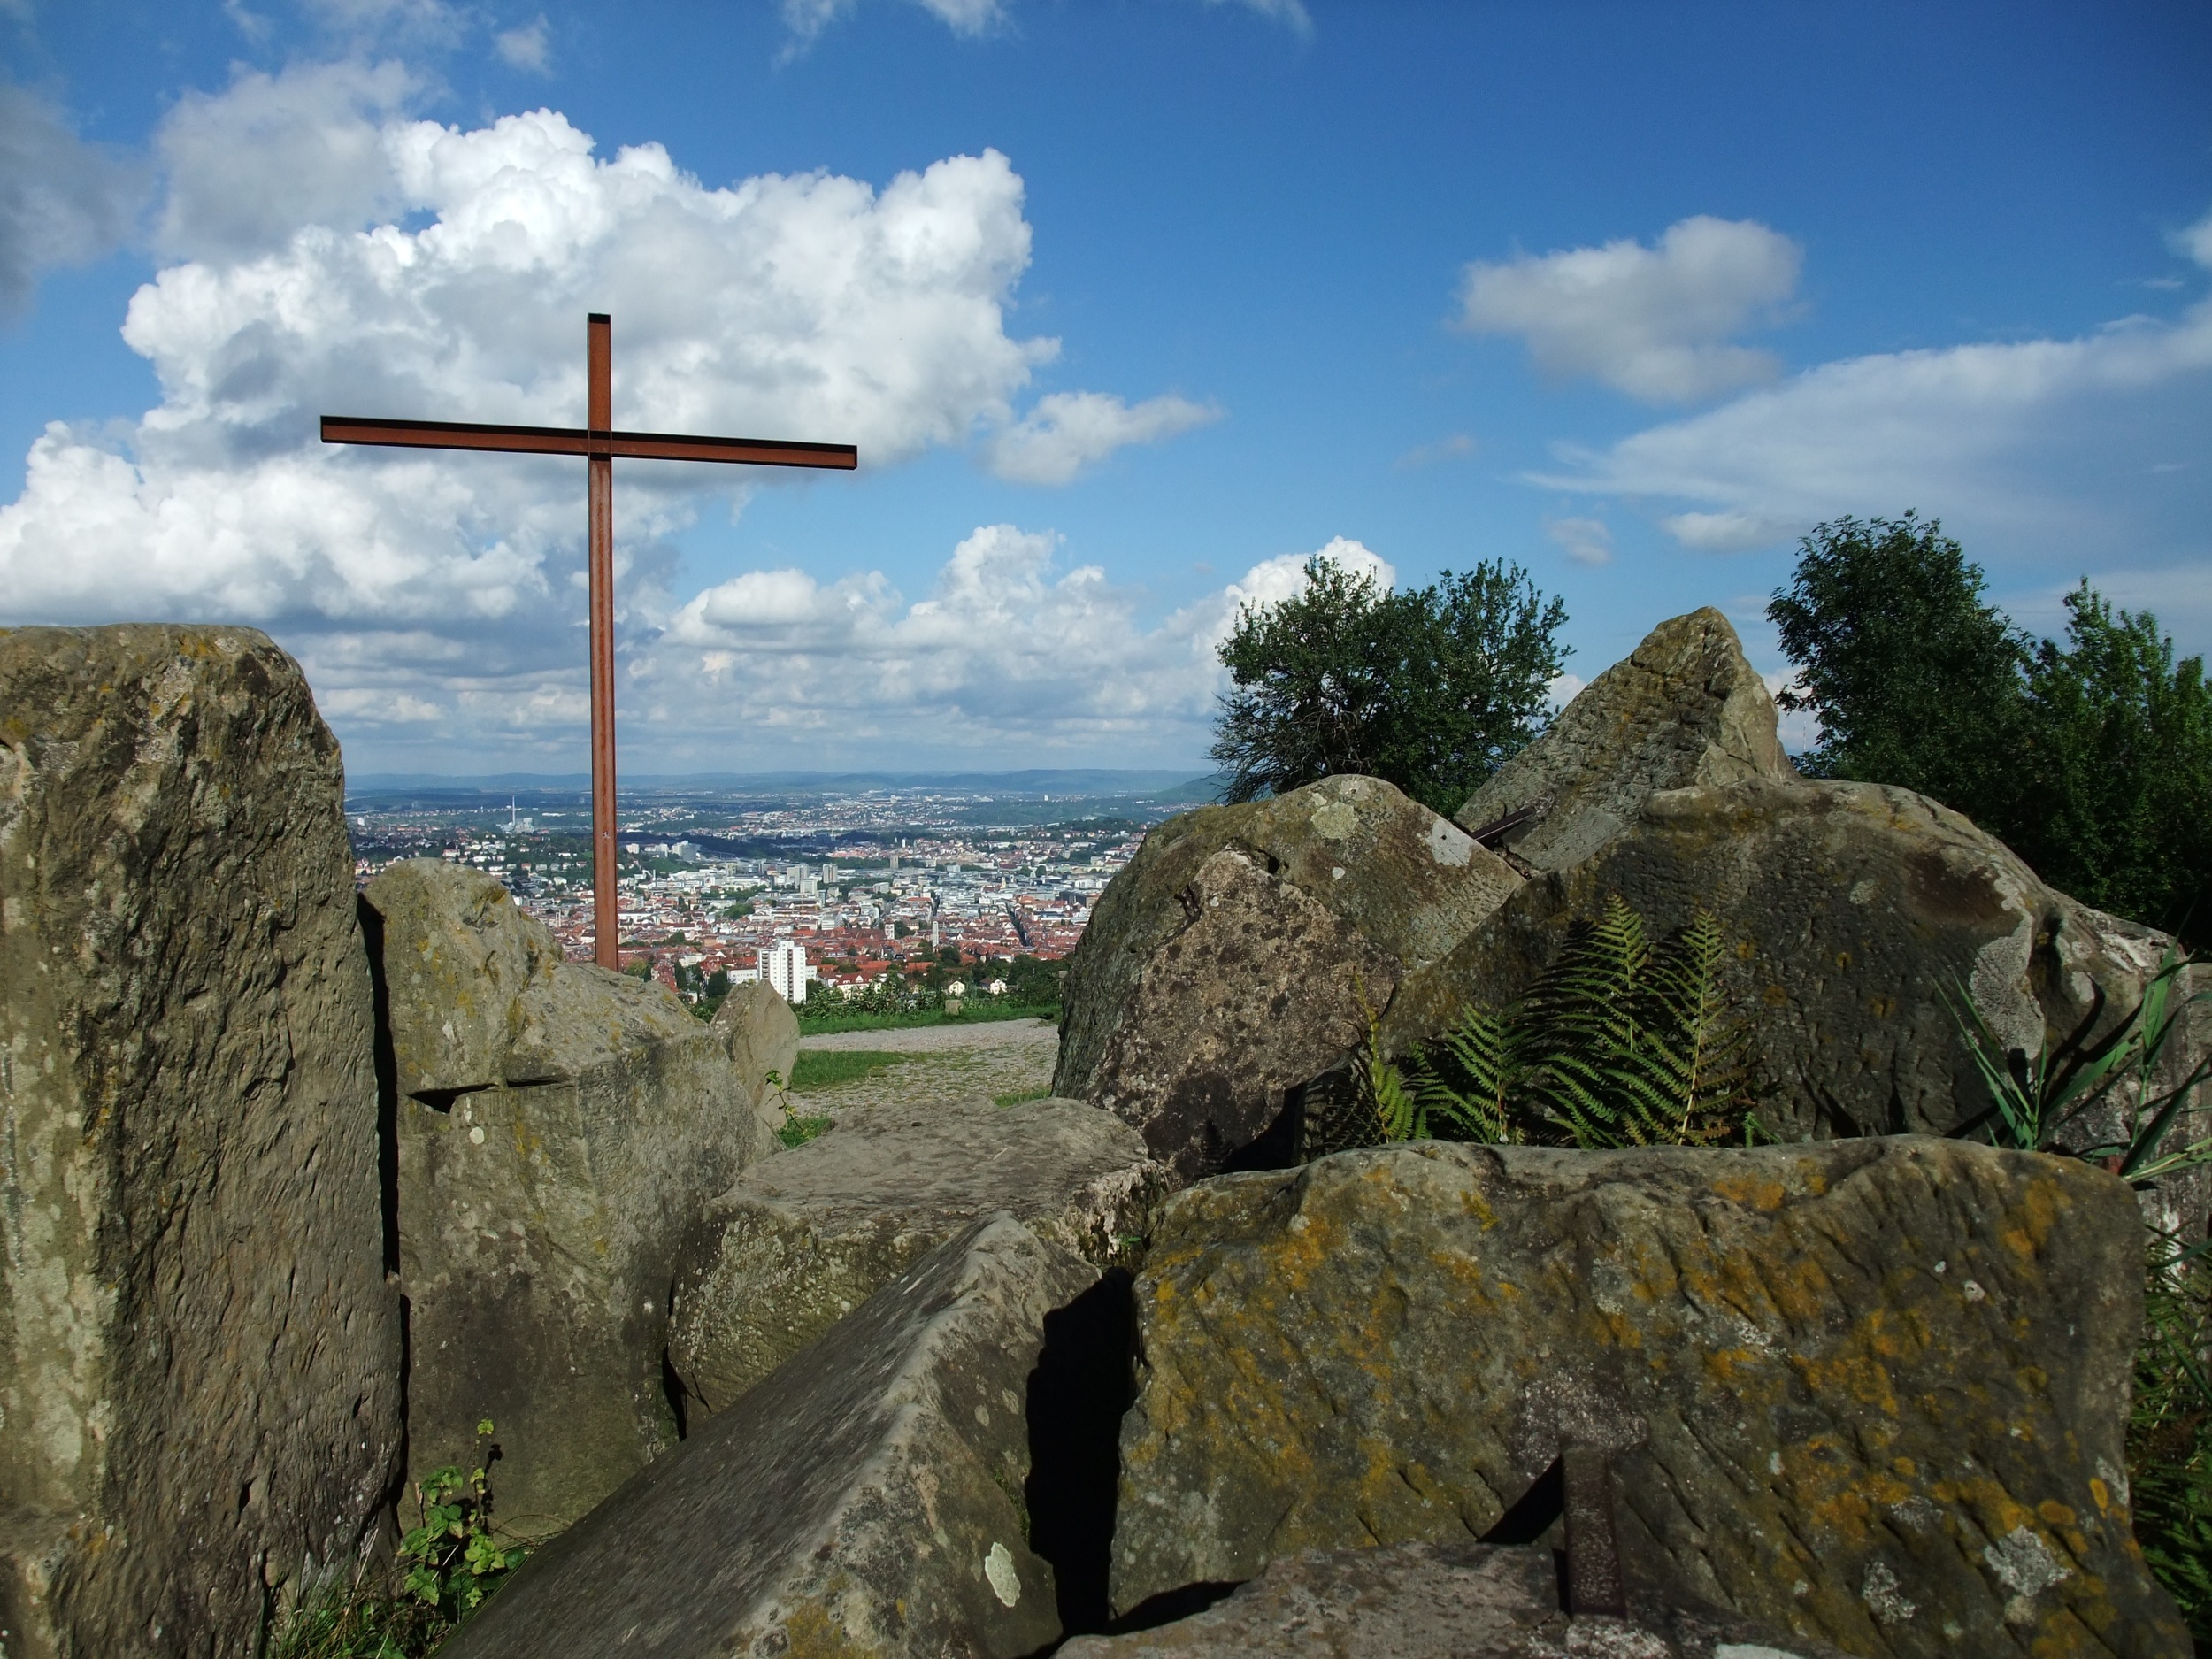 At the top of the Birkenkopf